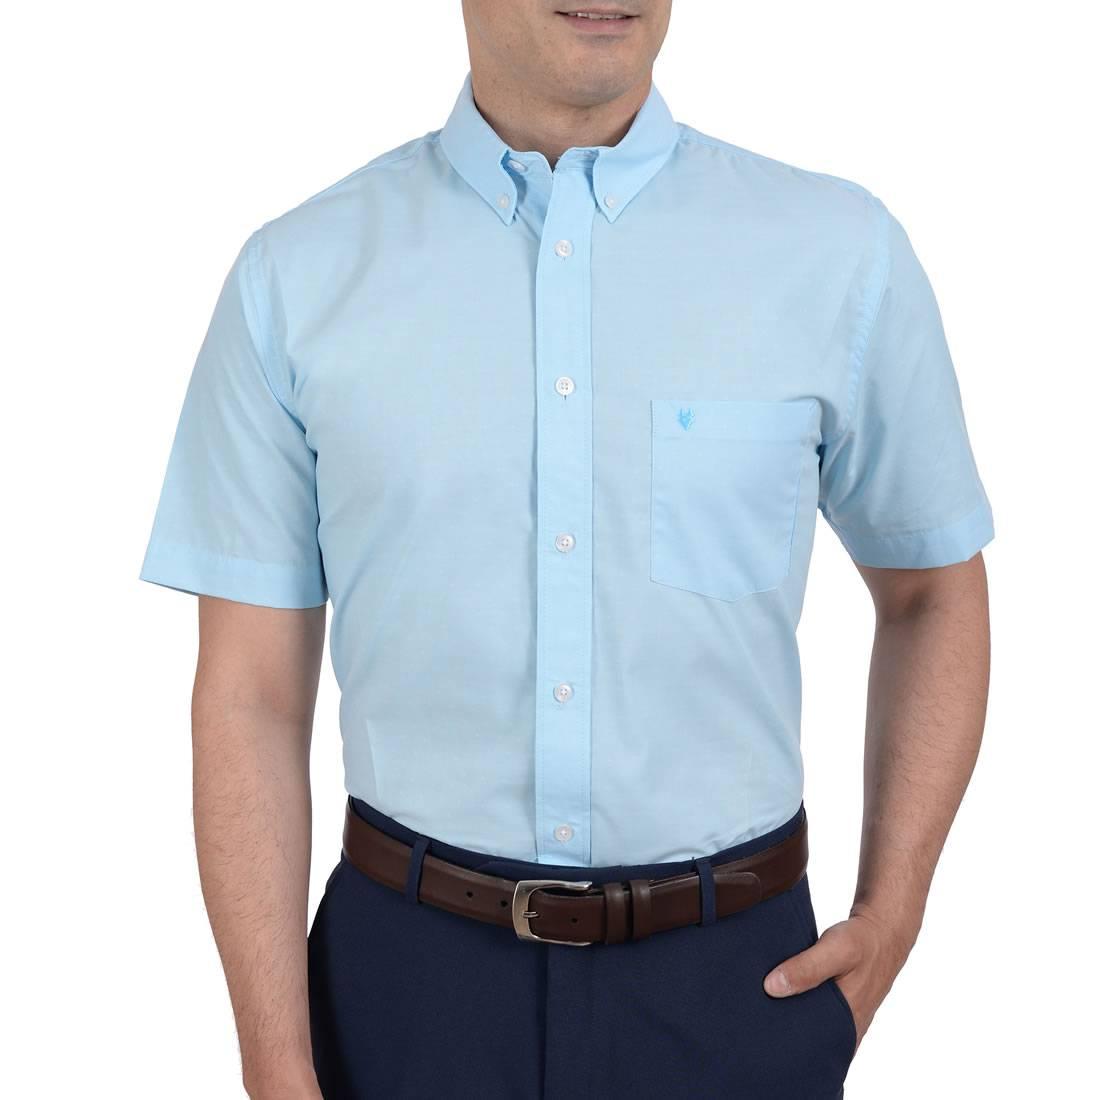 042201432426-01-Camisa-Casual-Manga-Corta-Botton-Down-Falso-Liso-Classic-Fit-Azul-Cadete-yale